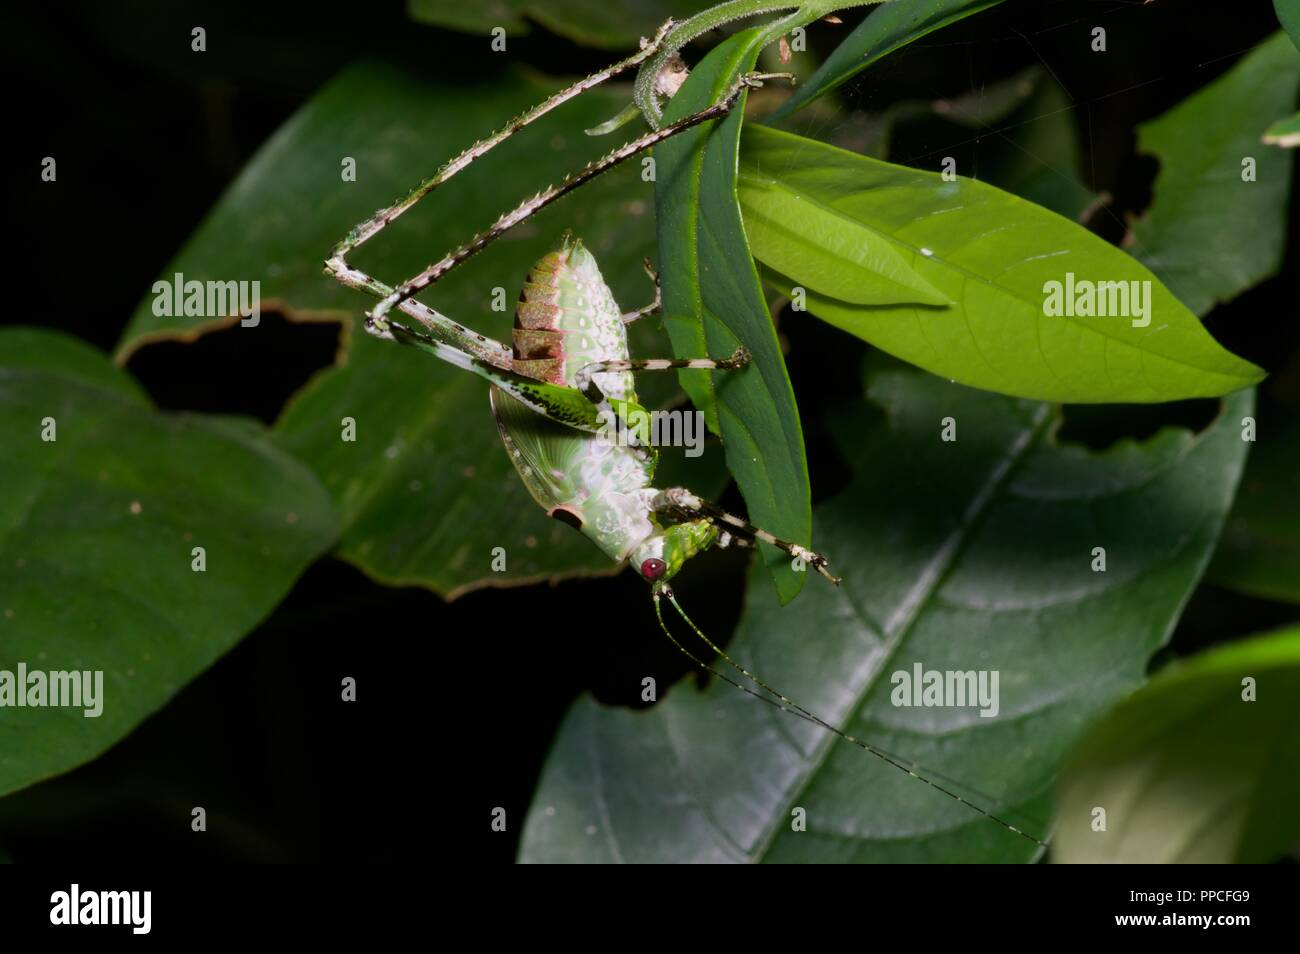 Eine katydid Nymphe (Familie Tettigoniidae) im Regenwald Laub in der Nacht in Atewa Range Forest Reserve, Ghana, Westafrika Stockbild